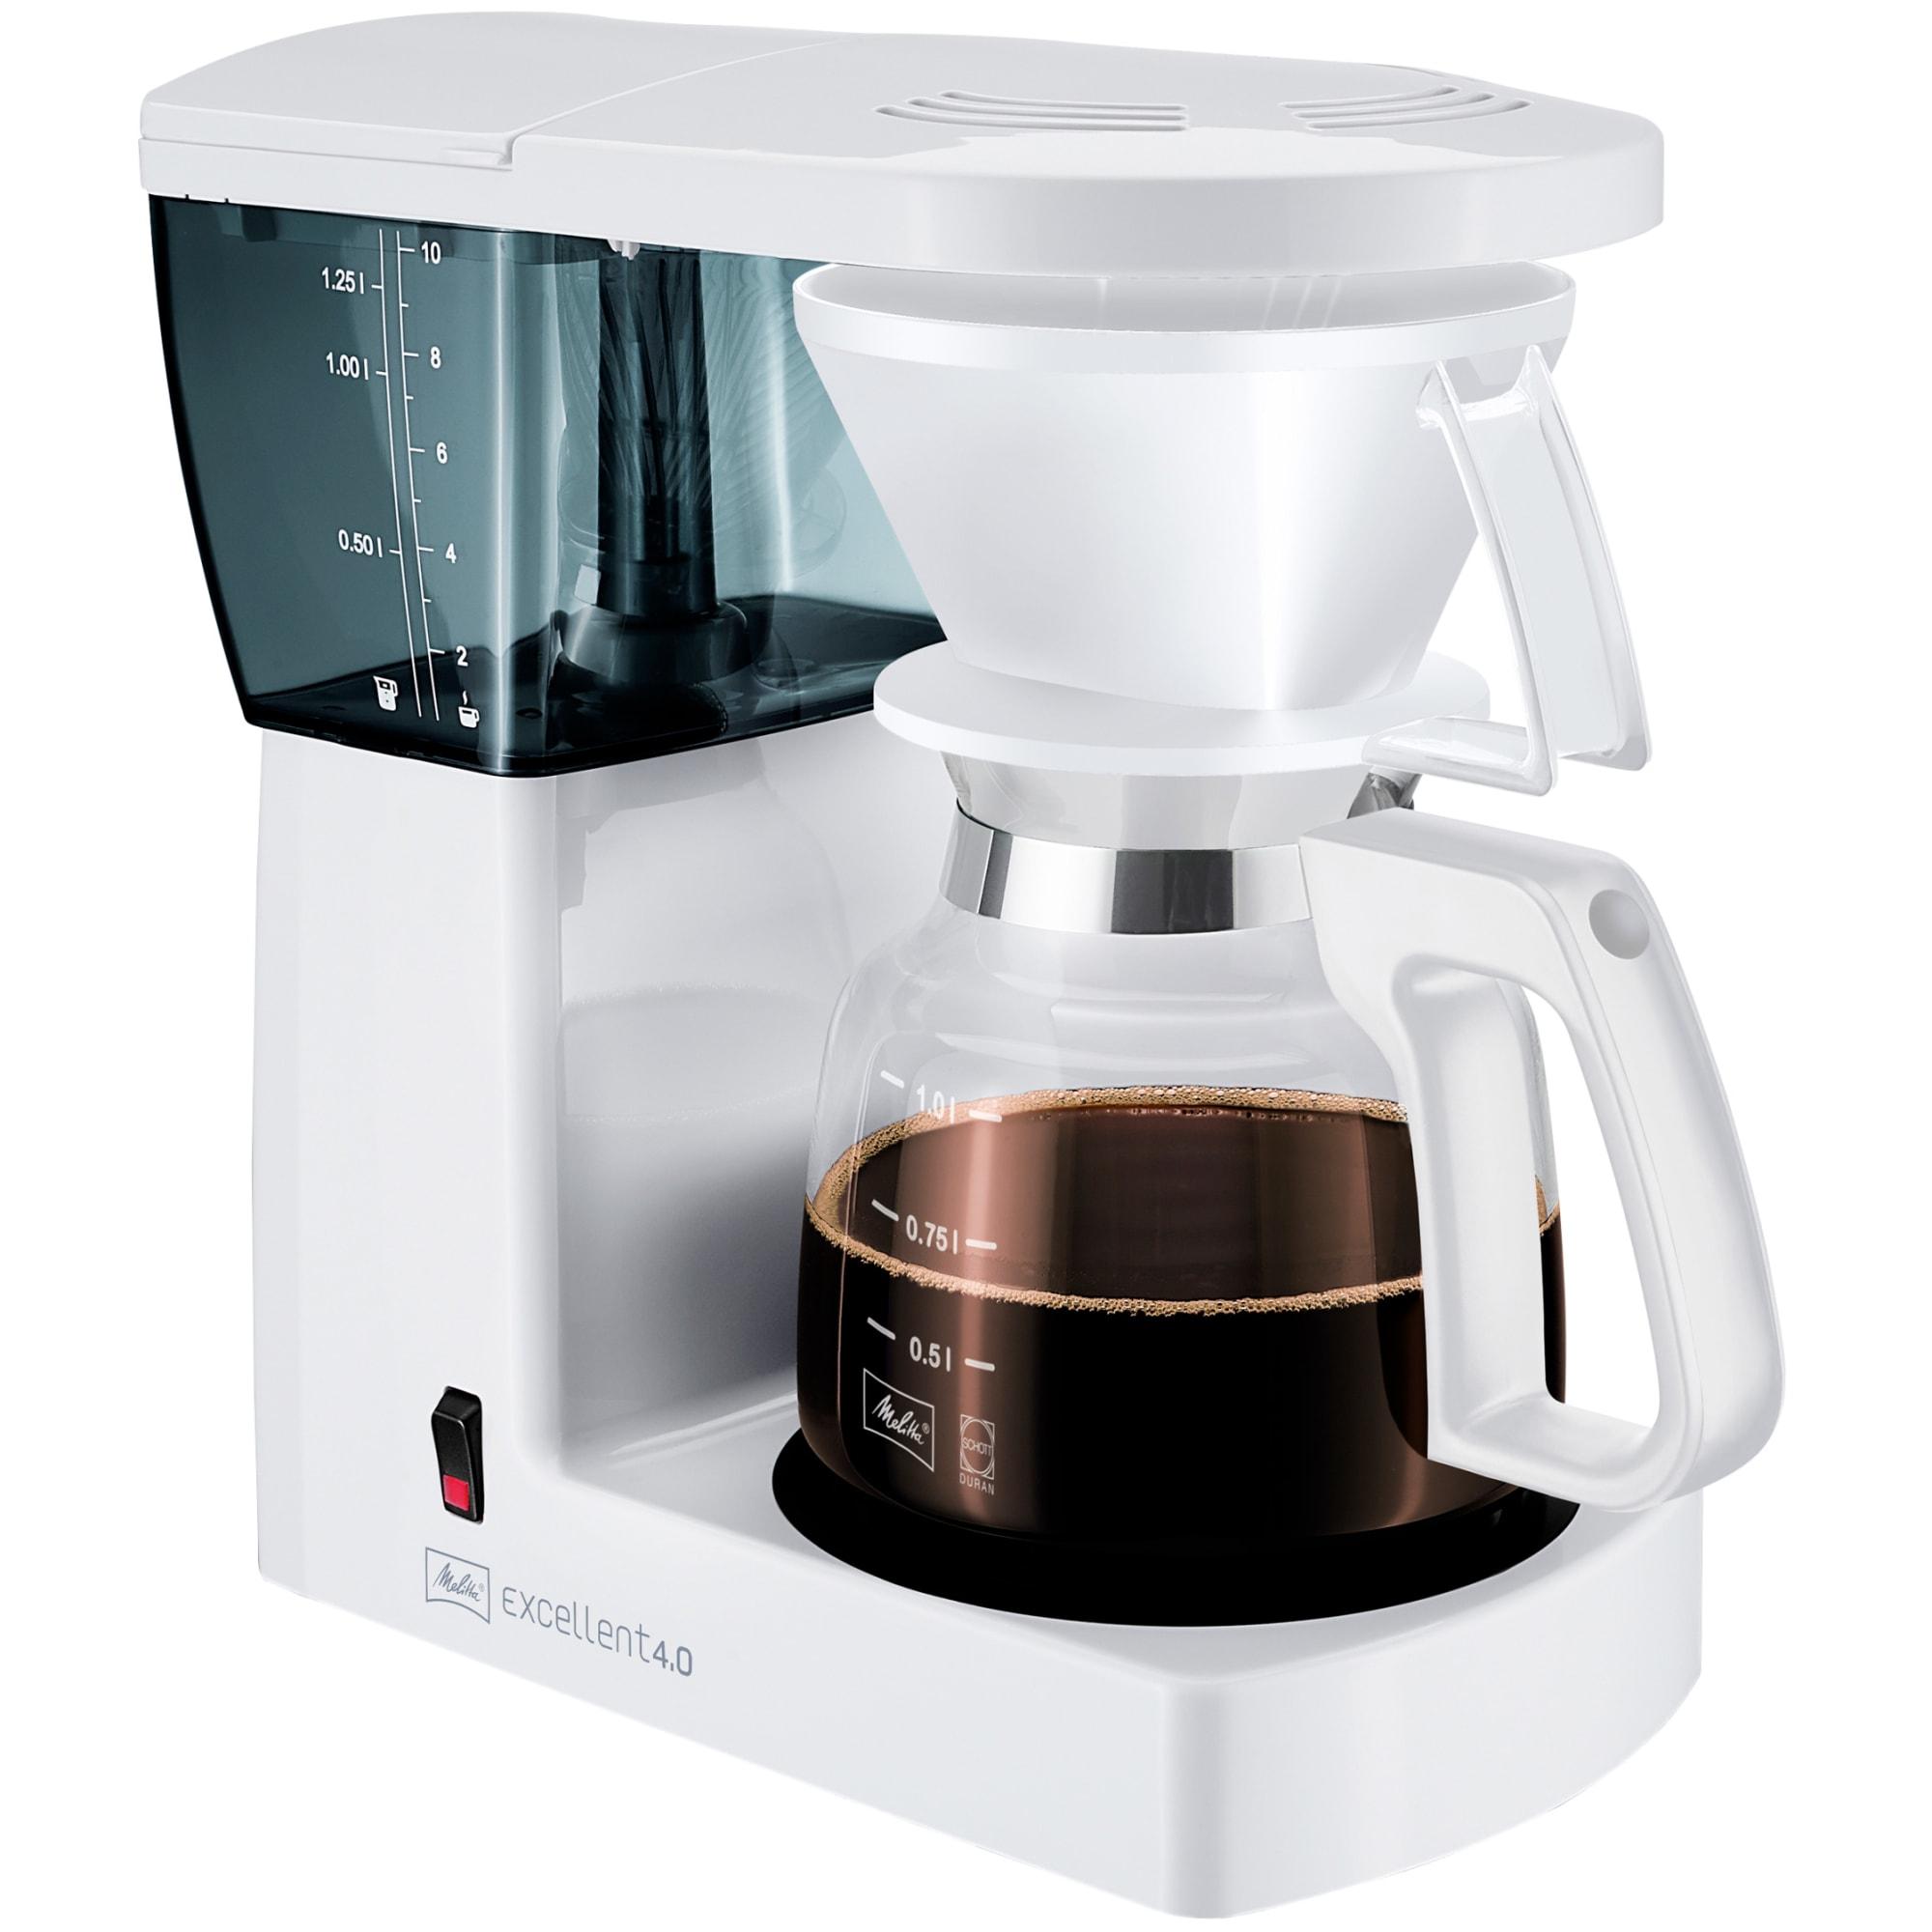 Danmarks mest solgte kaffemaskine - Med drypstop og vandindikator